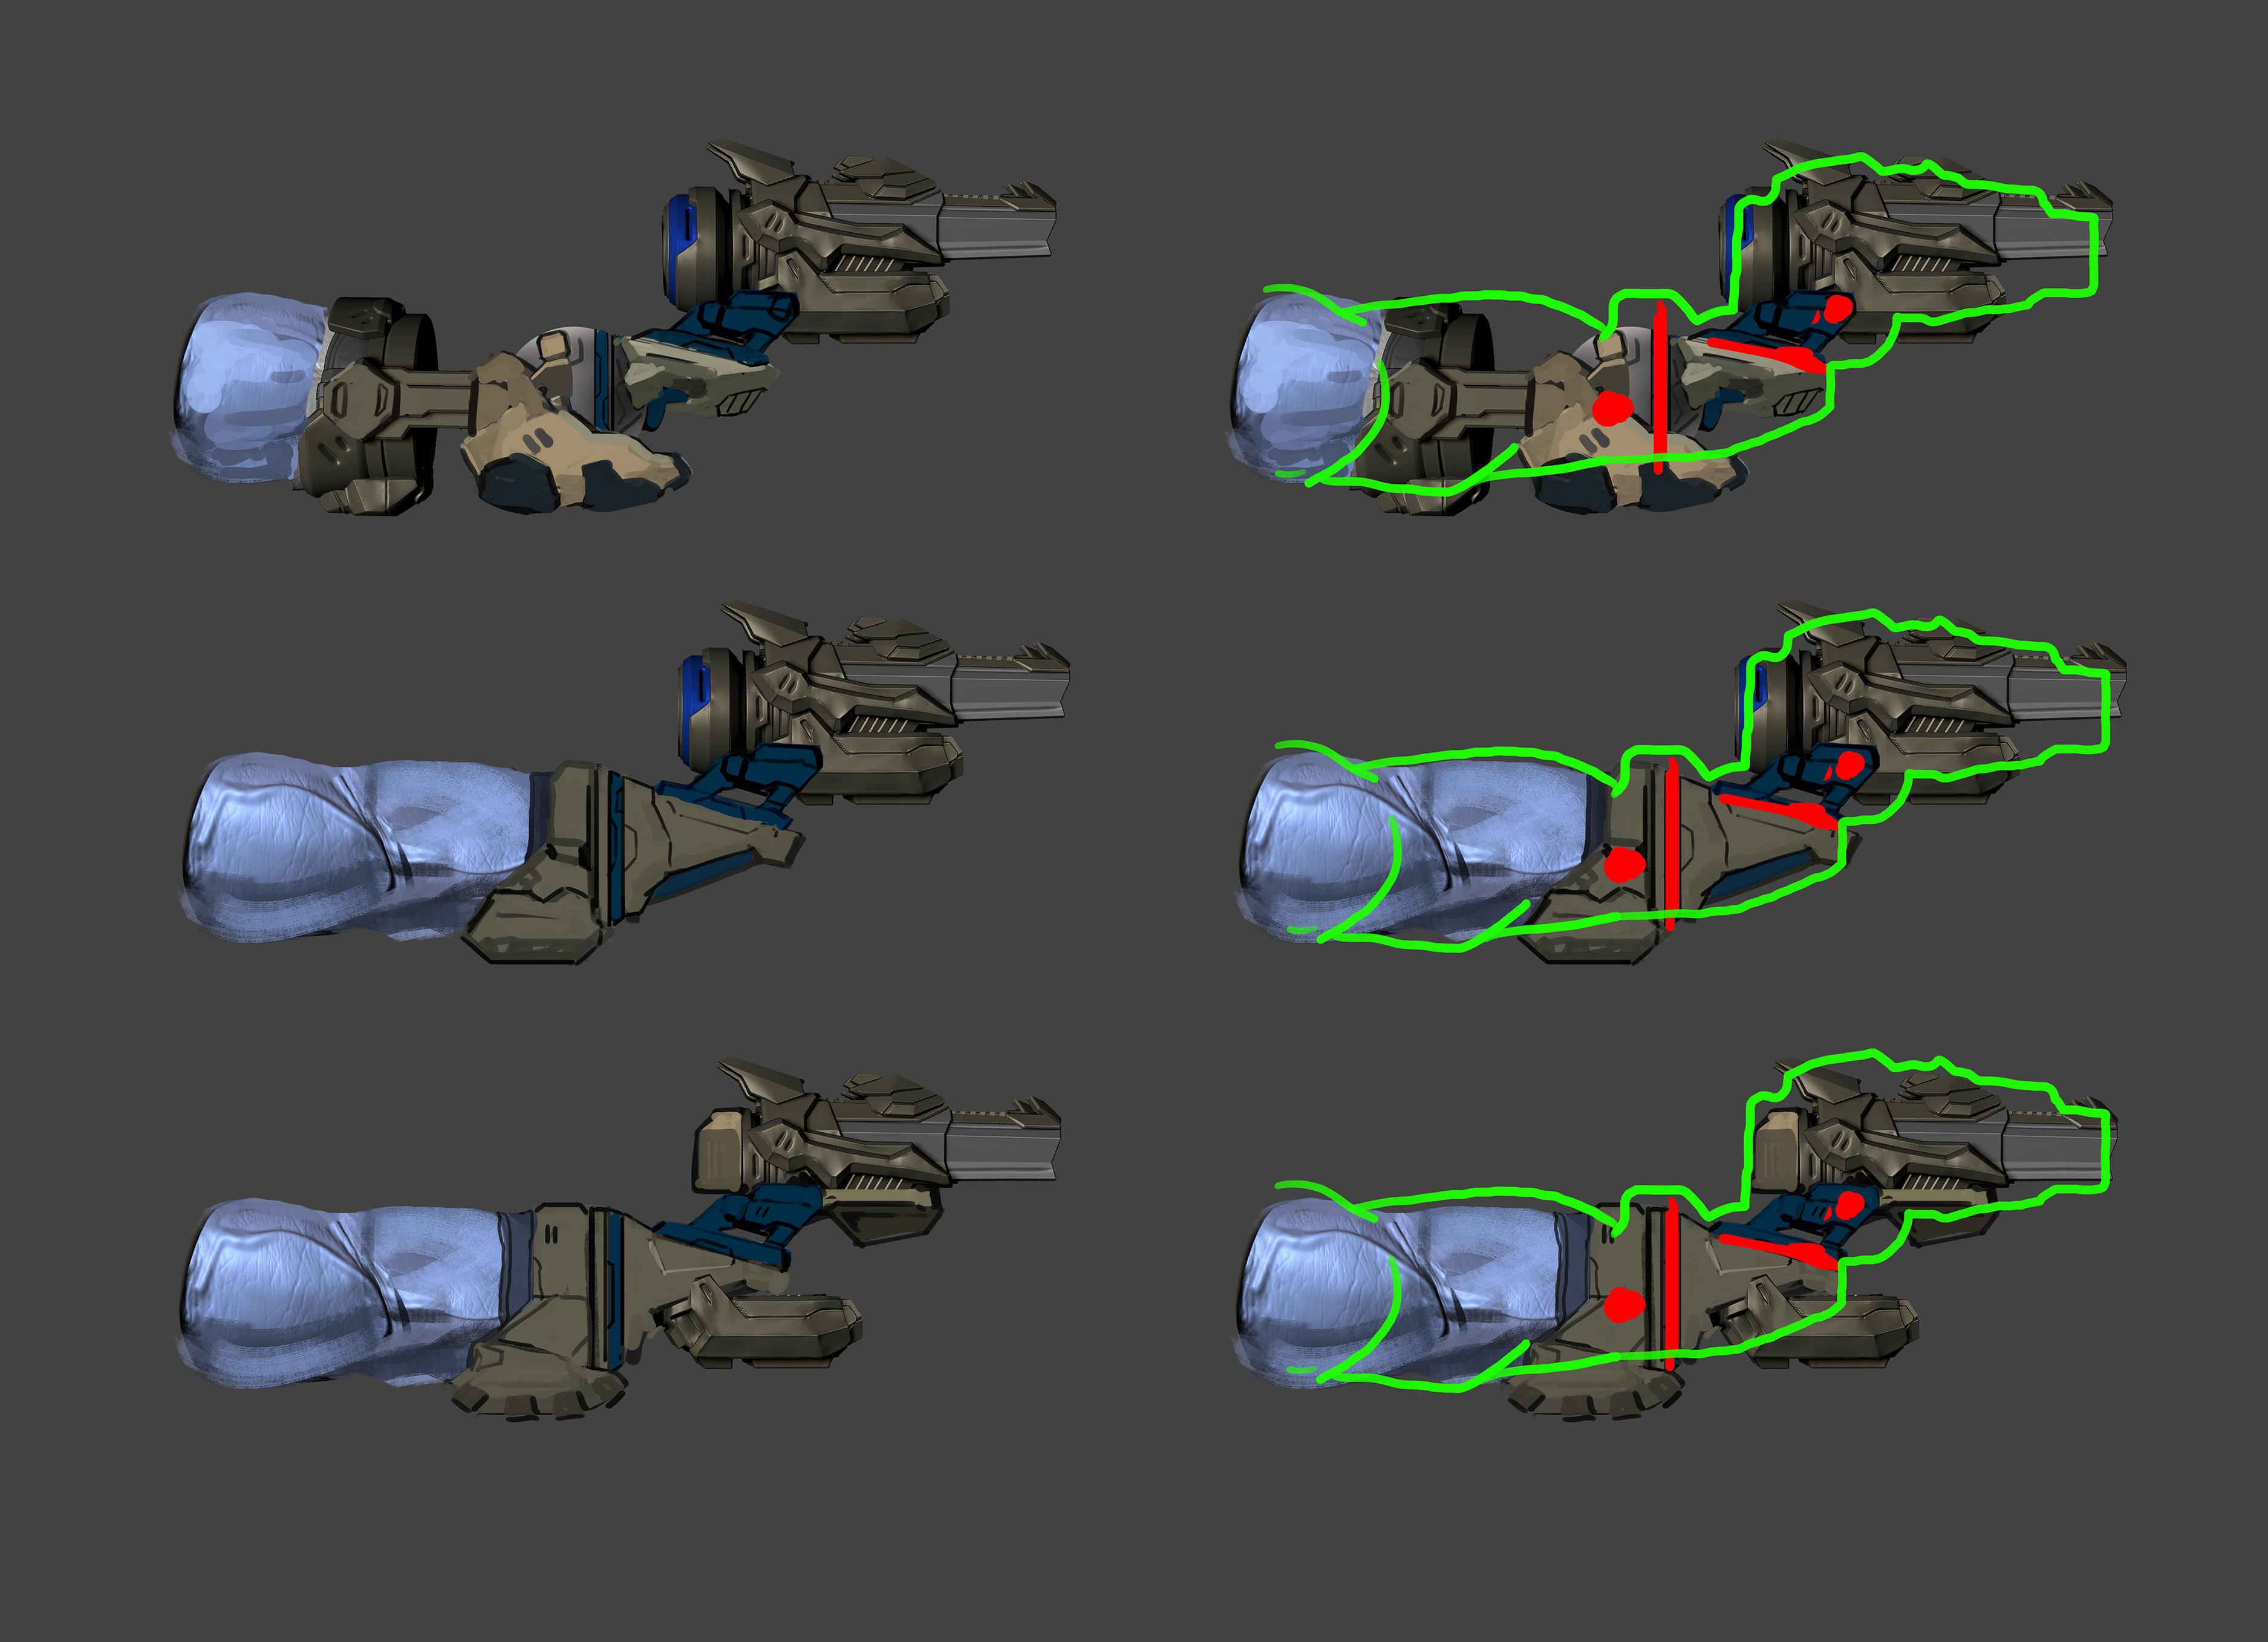 Concept by Kekai Kotaki  Gun concept, joint rotation